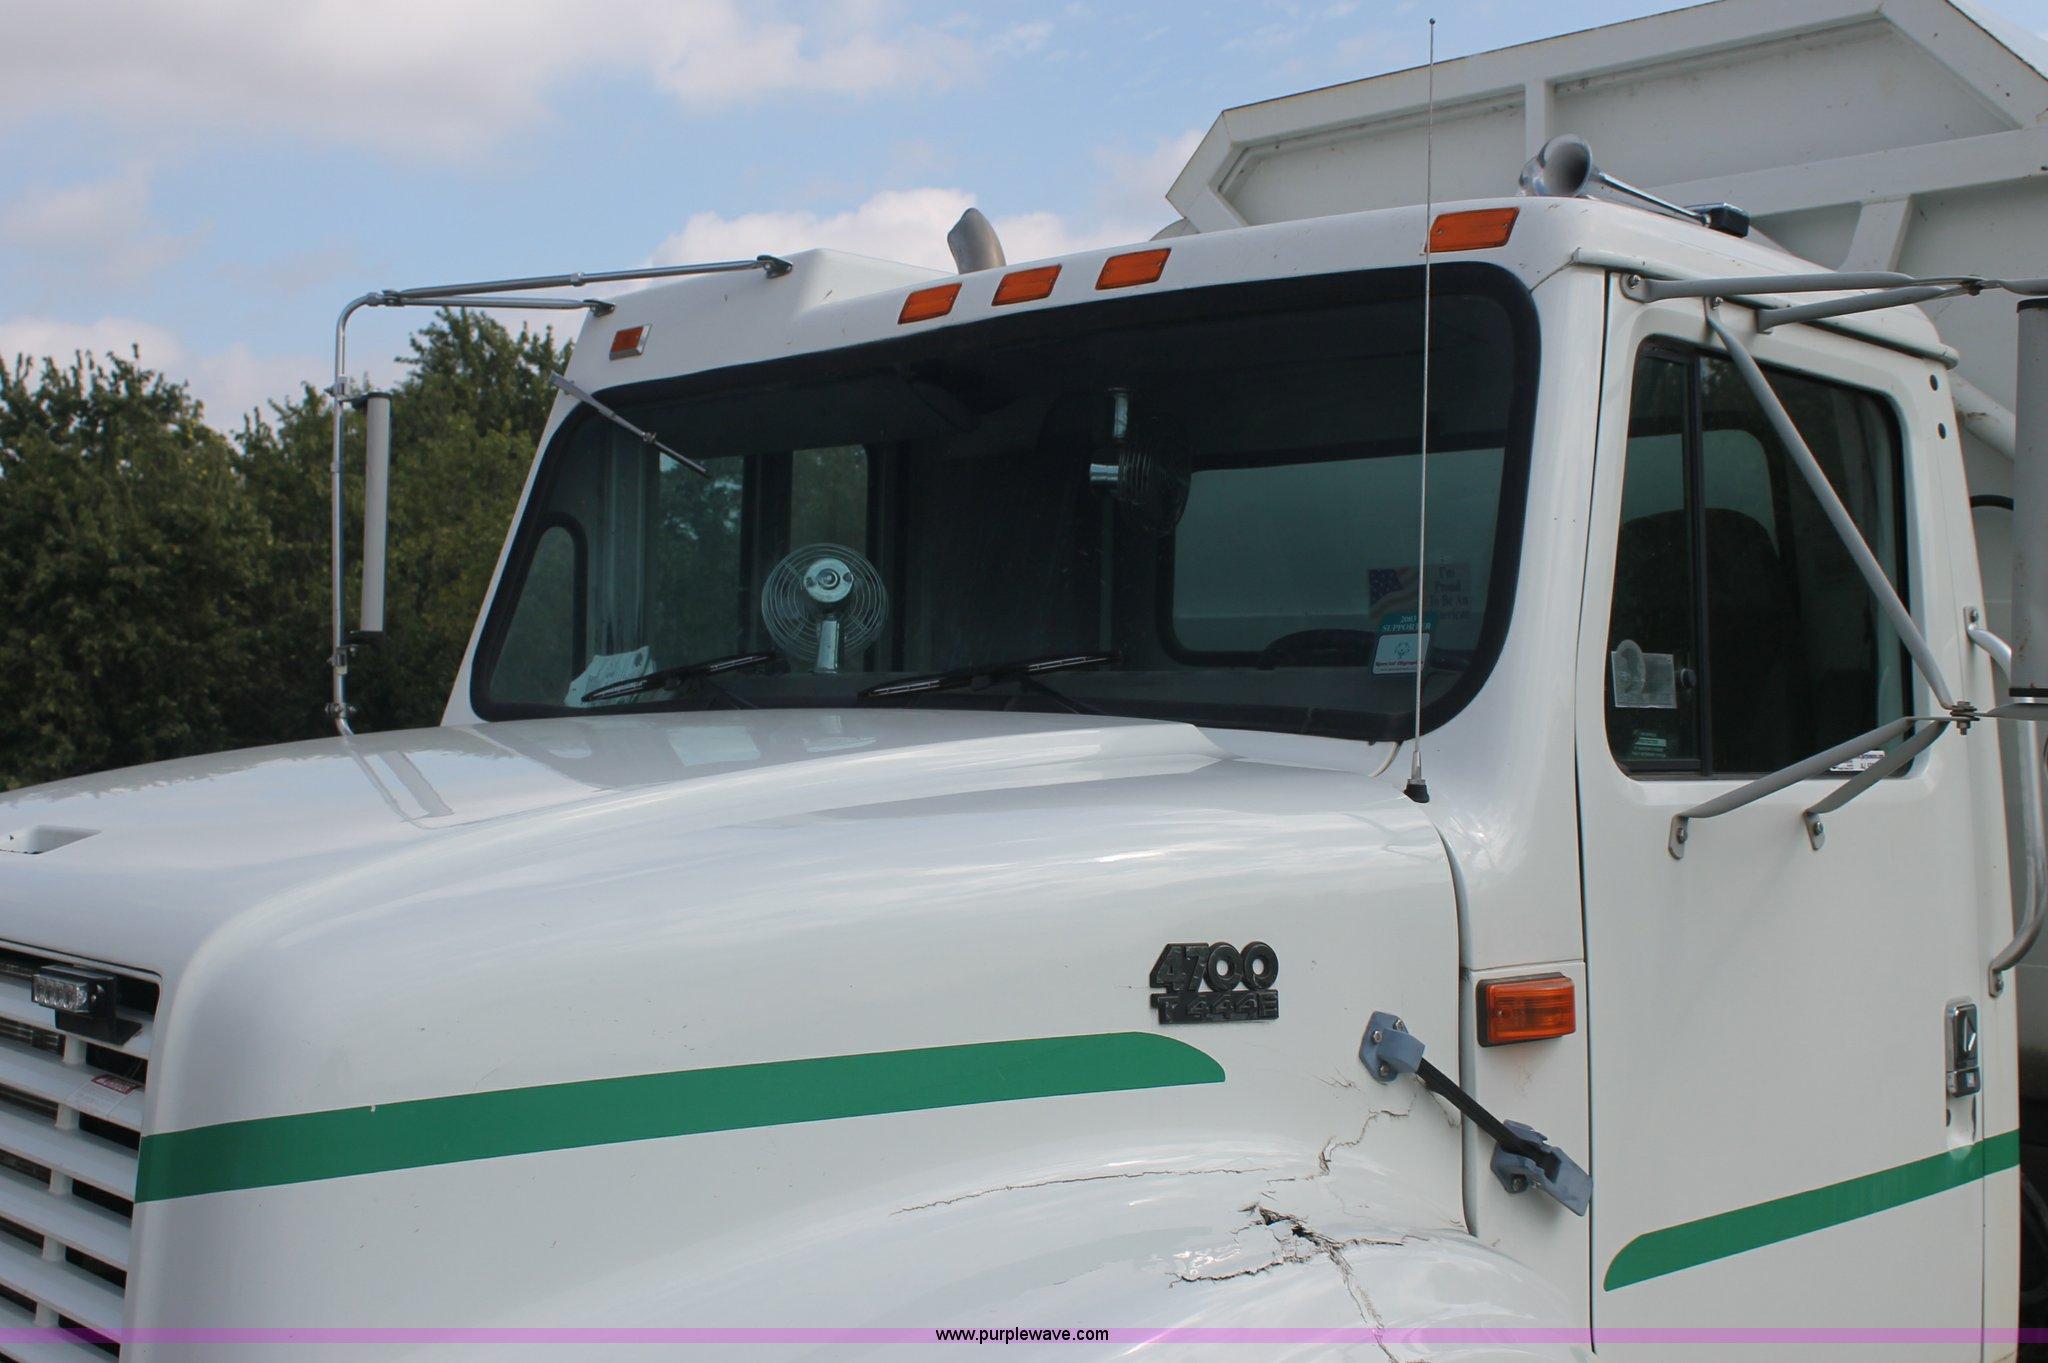 1999 International 4700 recycle truck | Item AJ9302 | SOLD!